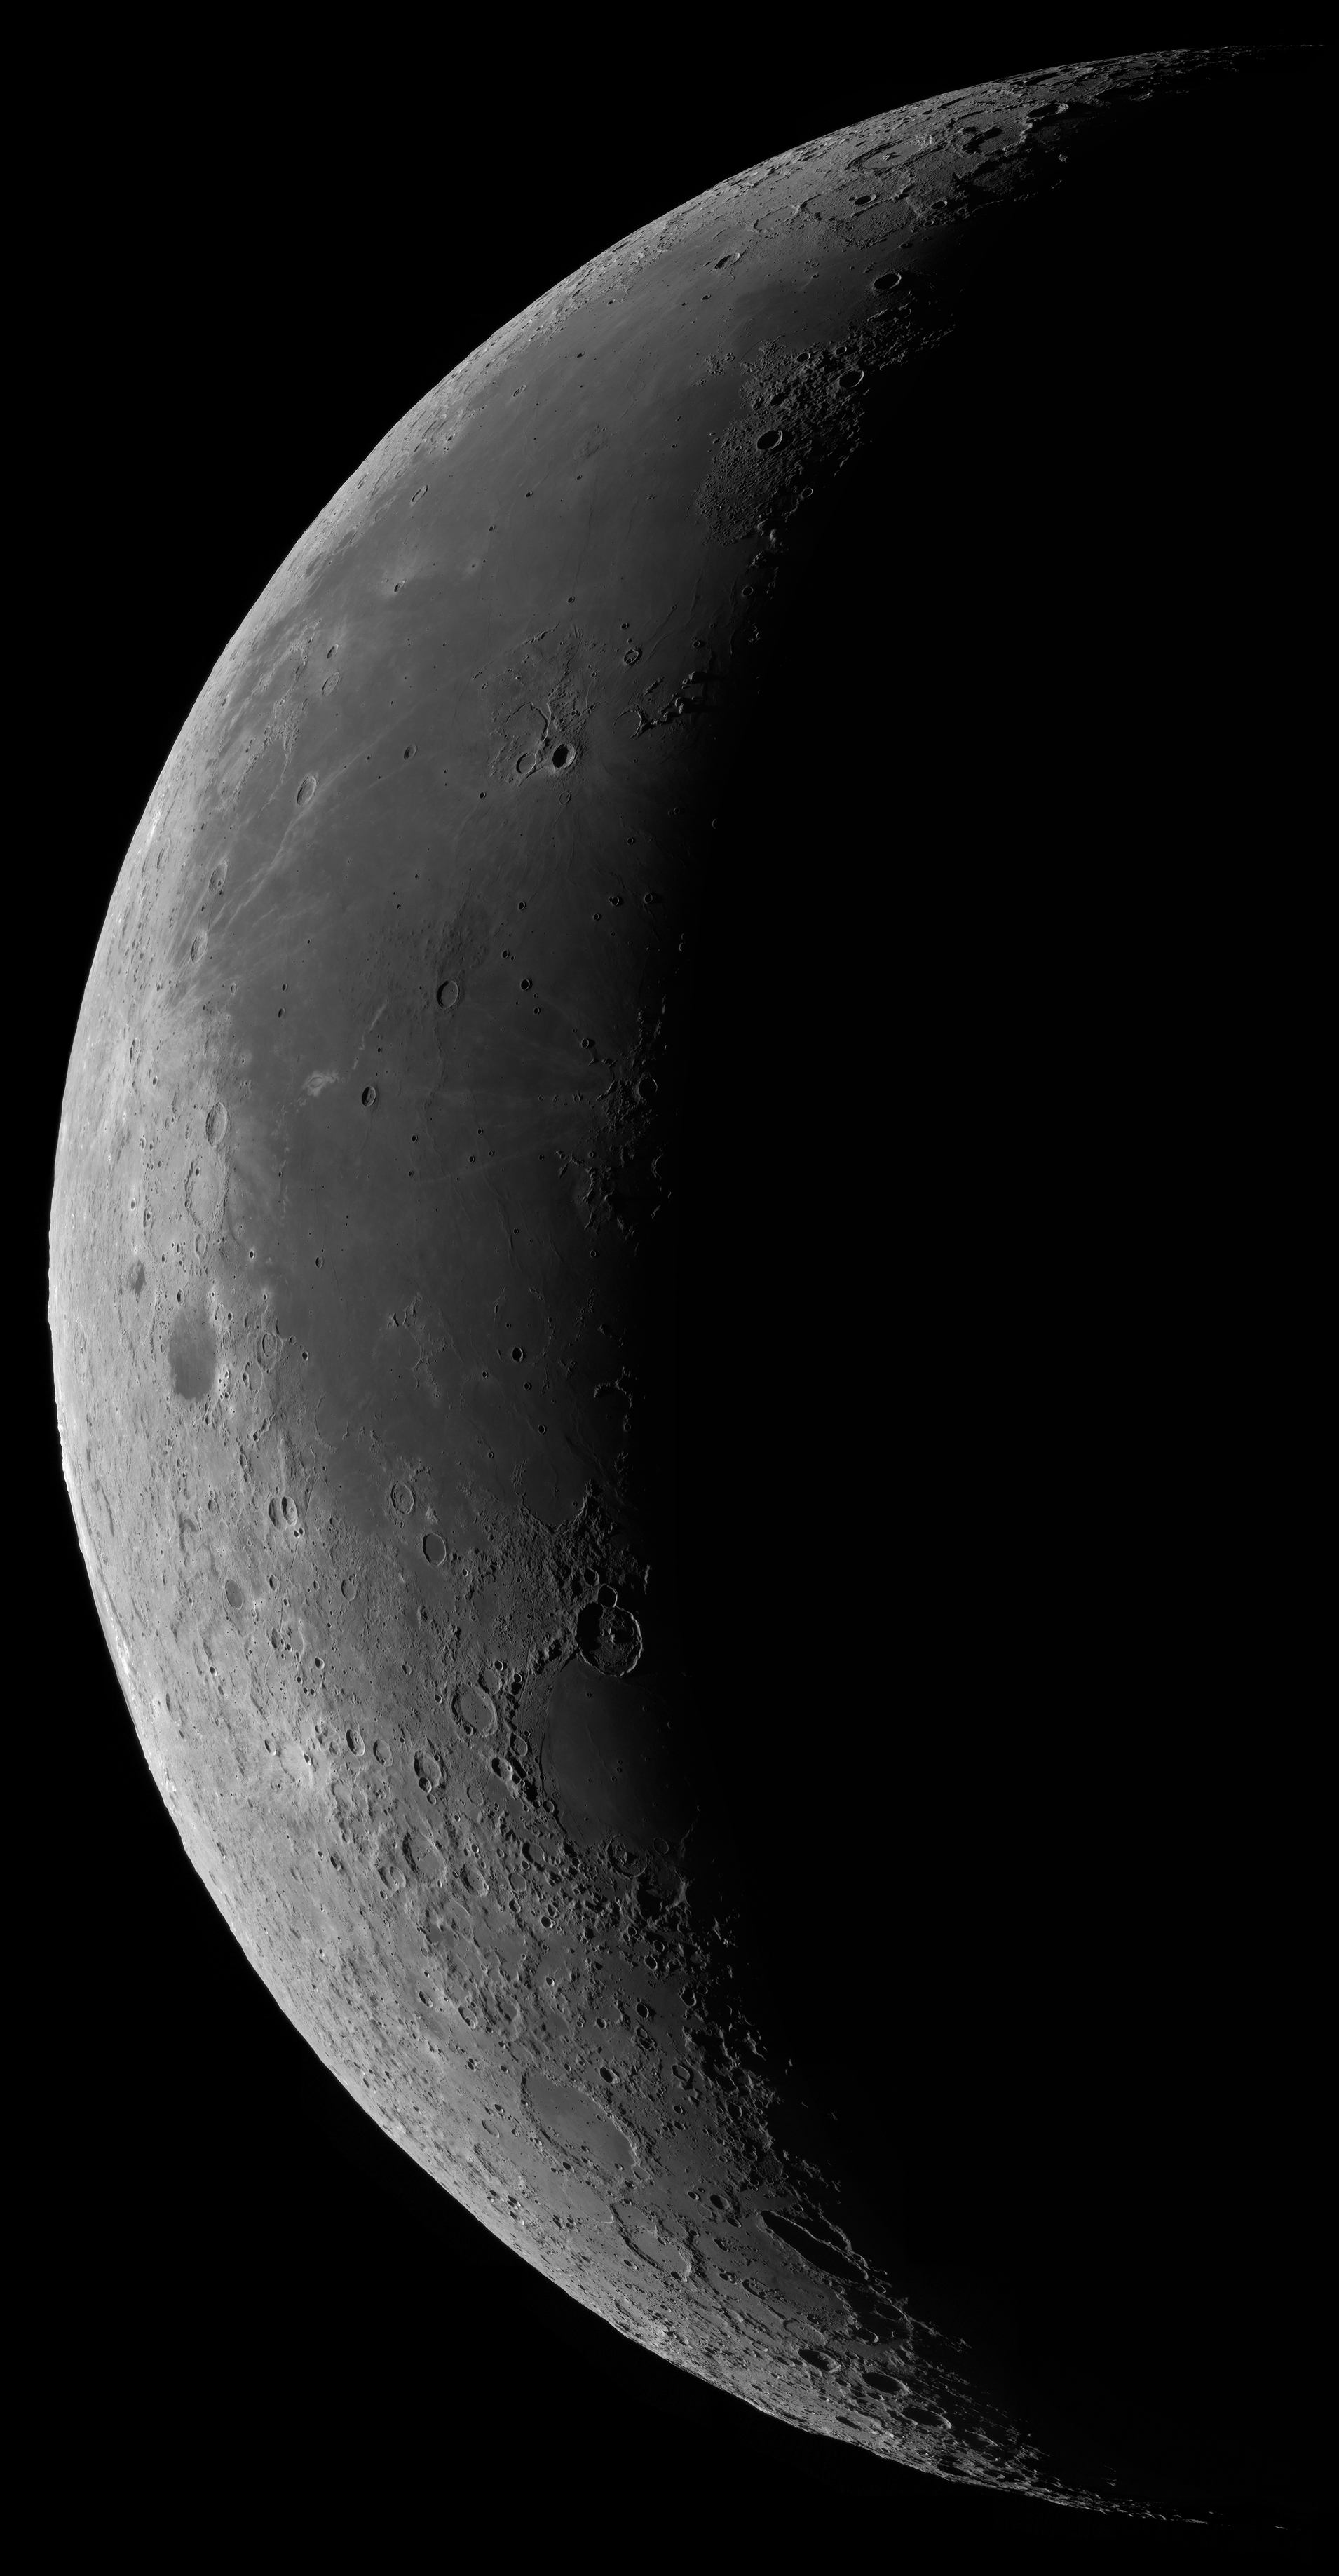 25 Day Crescent (x0.3) 04-Sept-10 03:58-05:12UT